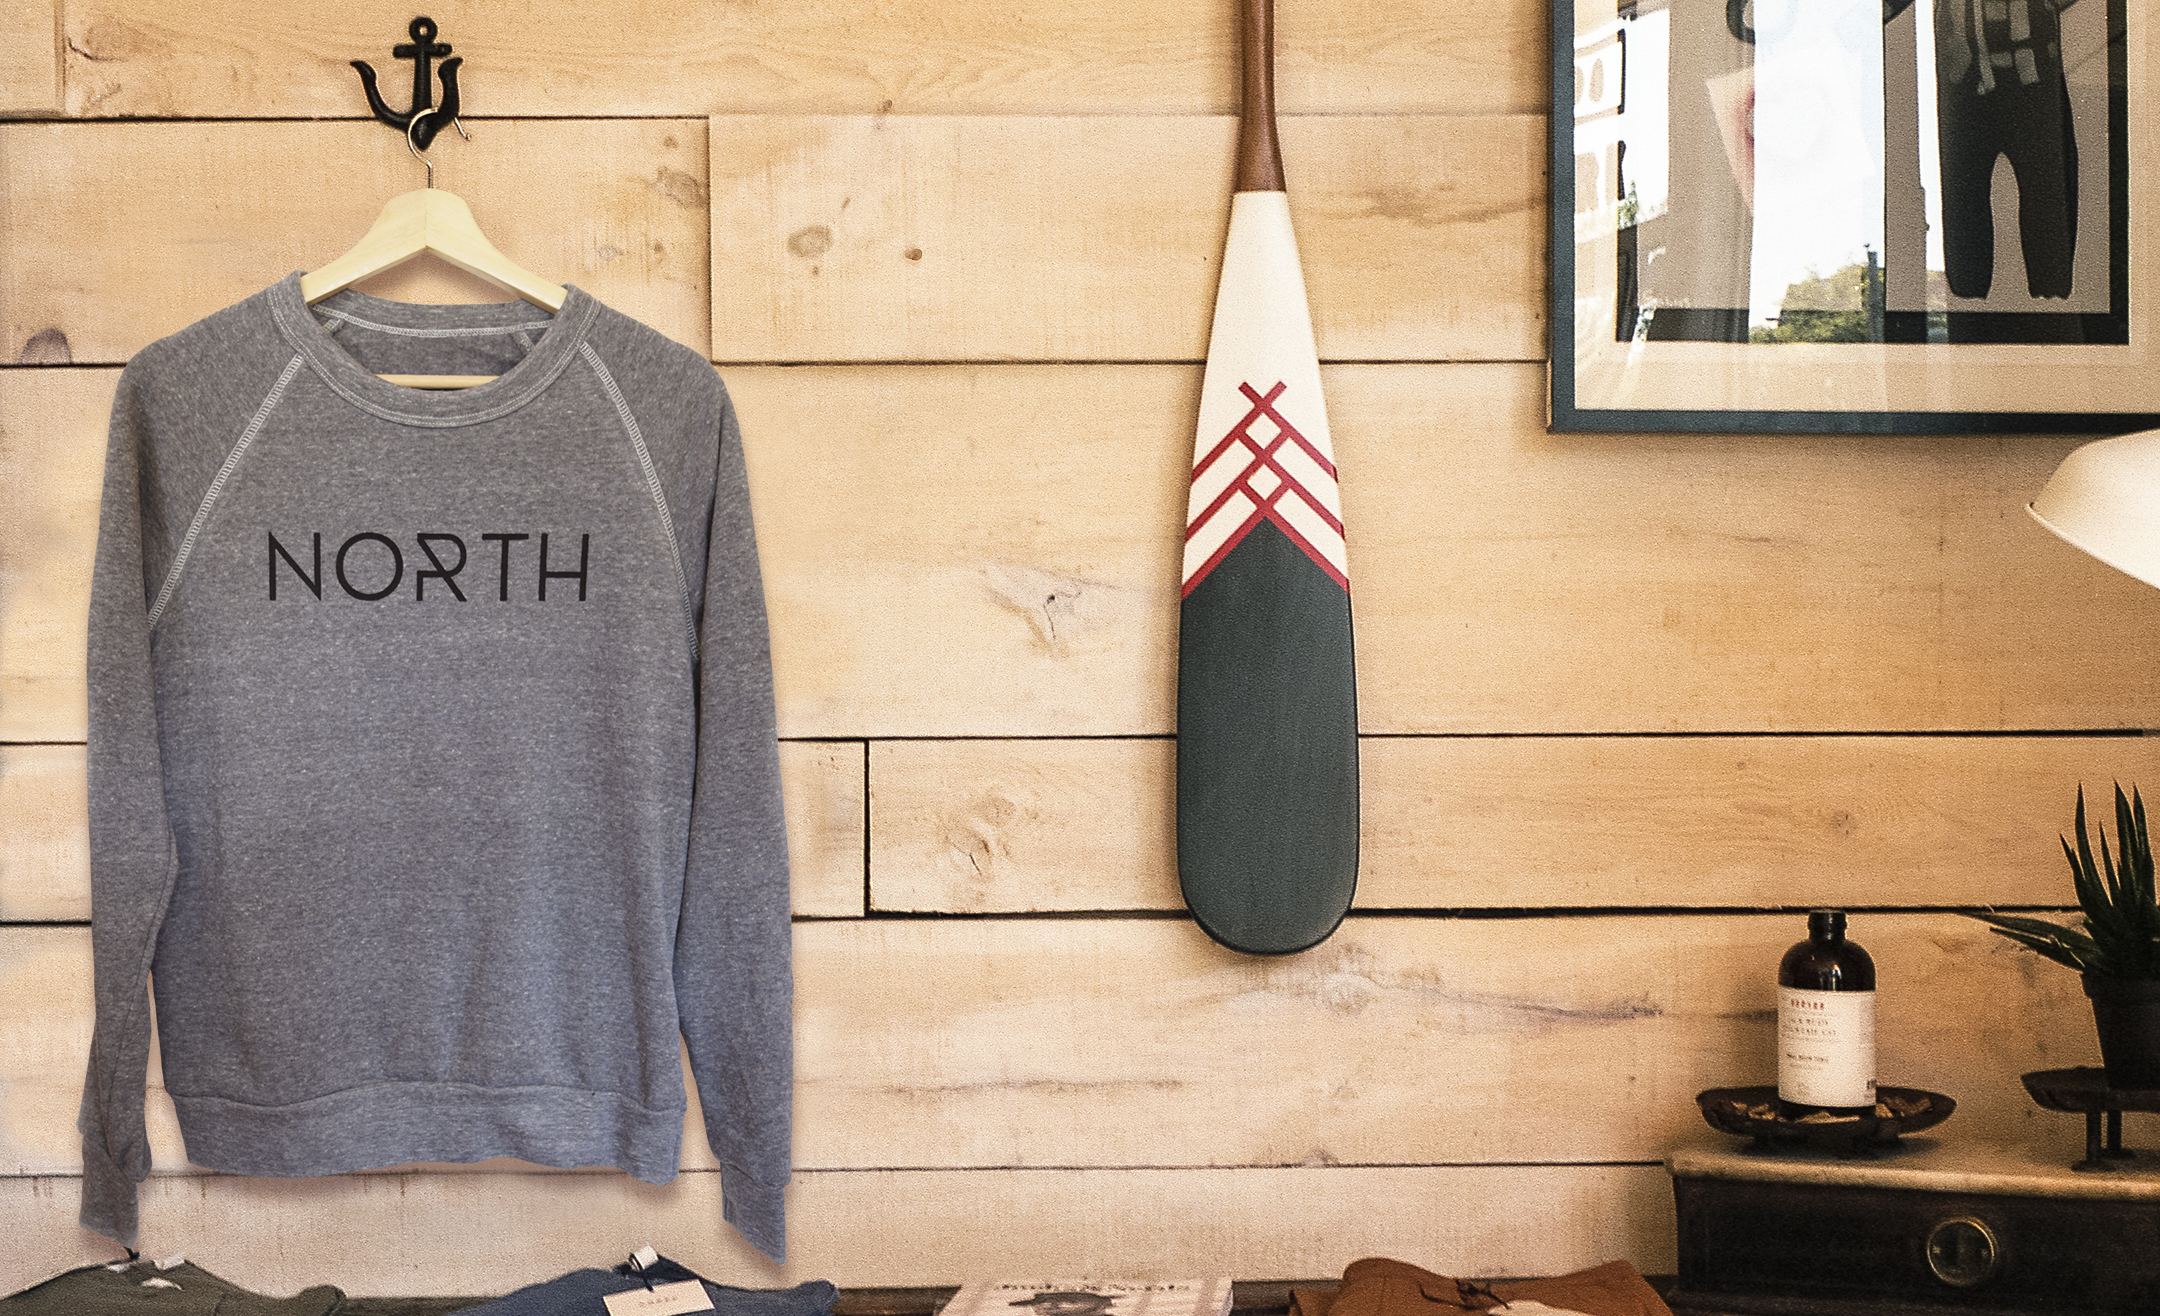 MinnesotaMade_NORTH_sweatshirt_cabin.jpg